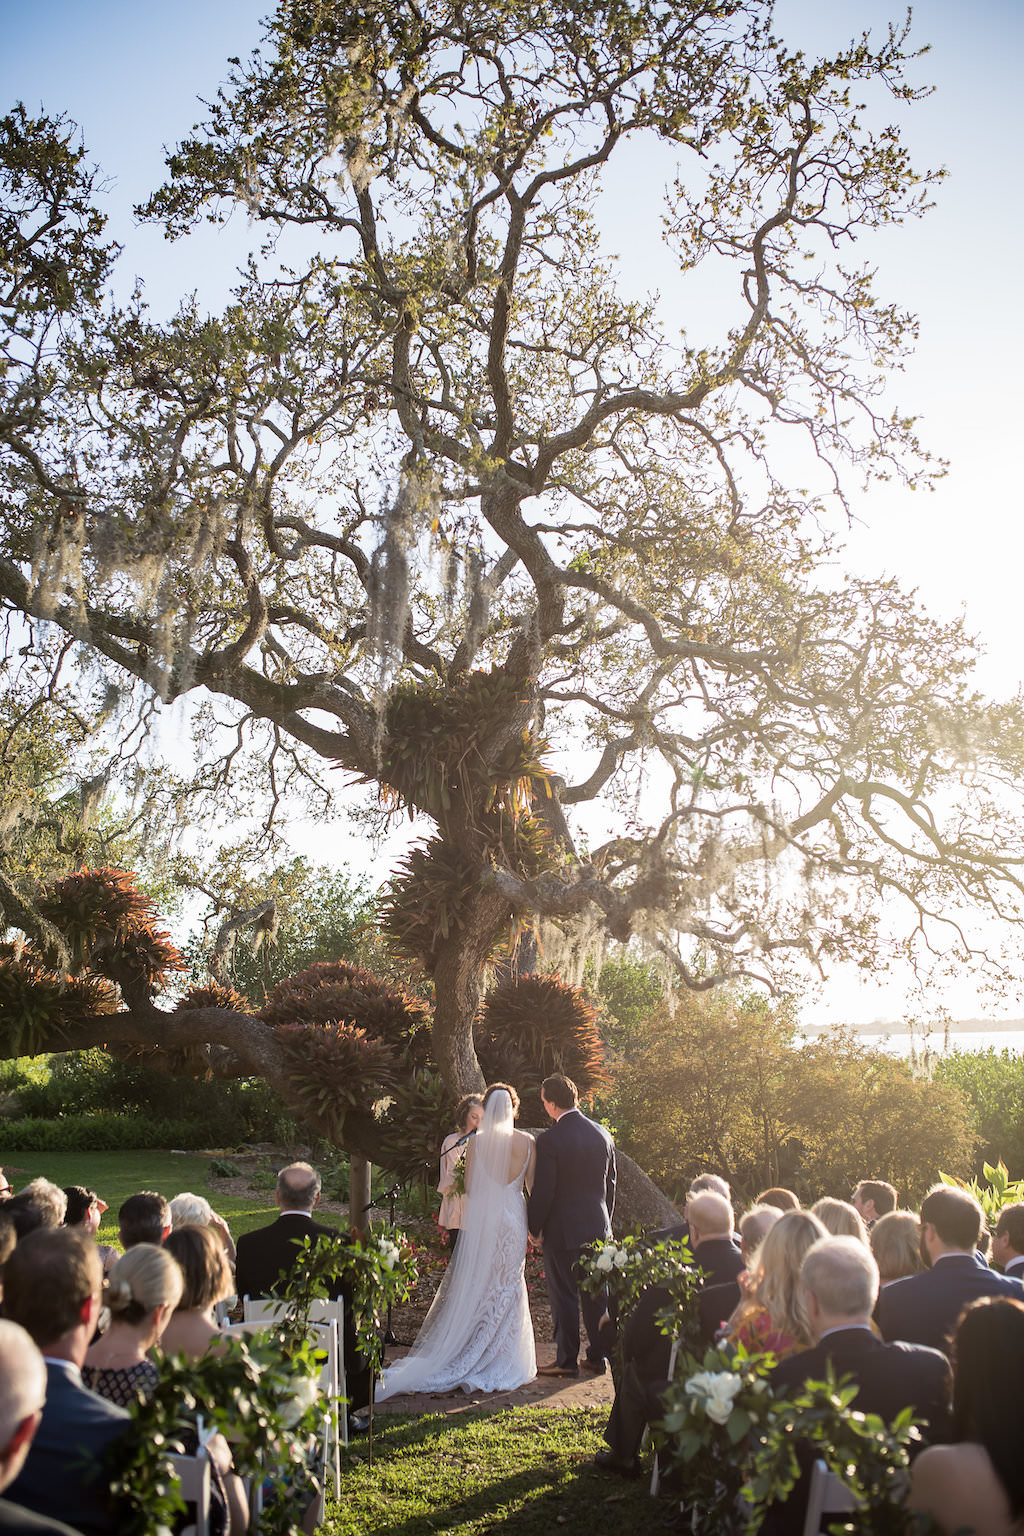 Sunset Florida Garden Bride and Groom Wedding Ceremony Portrait | Tampa Bay Photographer Cat Pennenga Photography| Sarasota Wedding Venue Marie Selby Botanical Gardens | Wedding Planner NK Productions